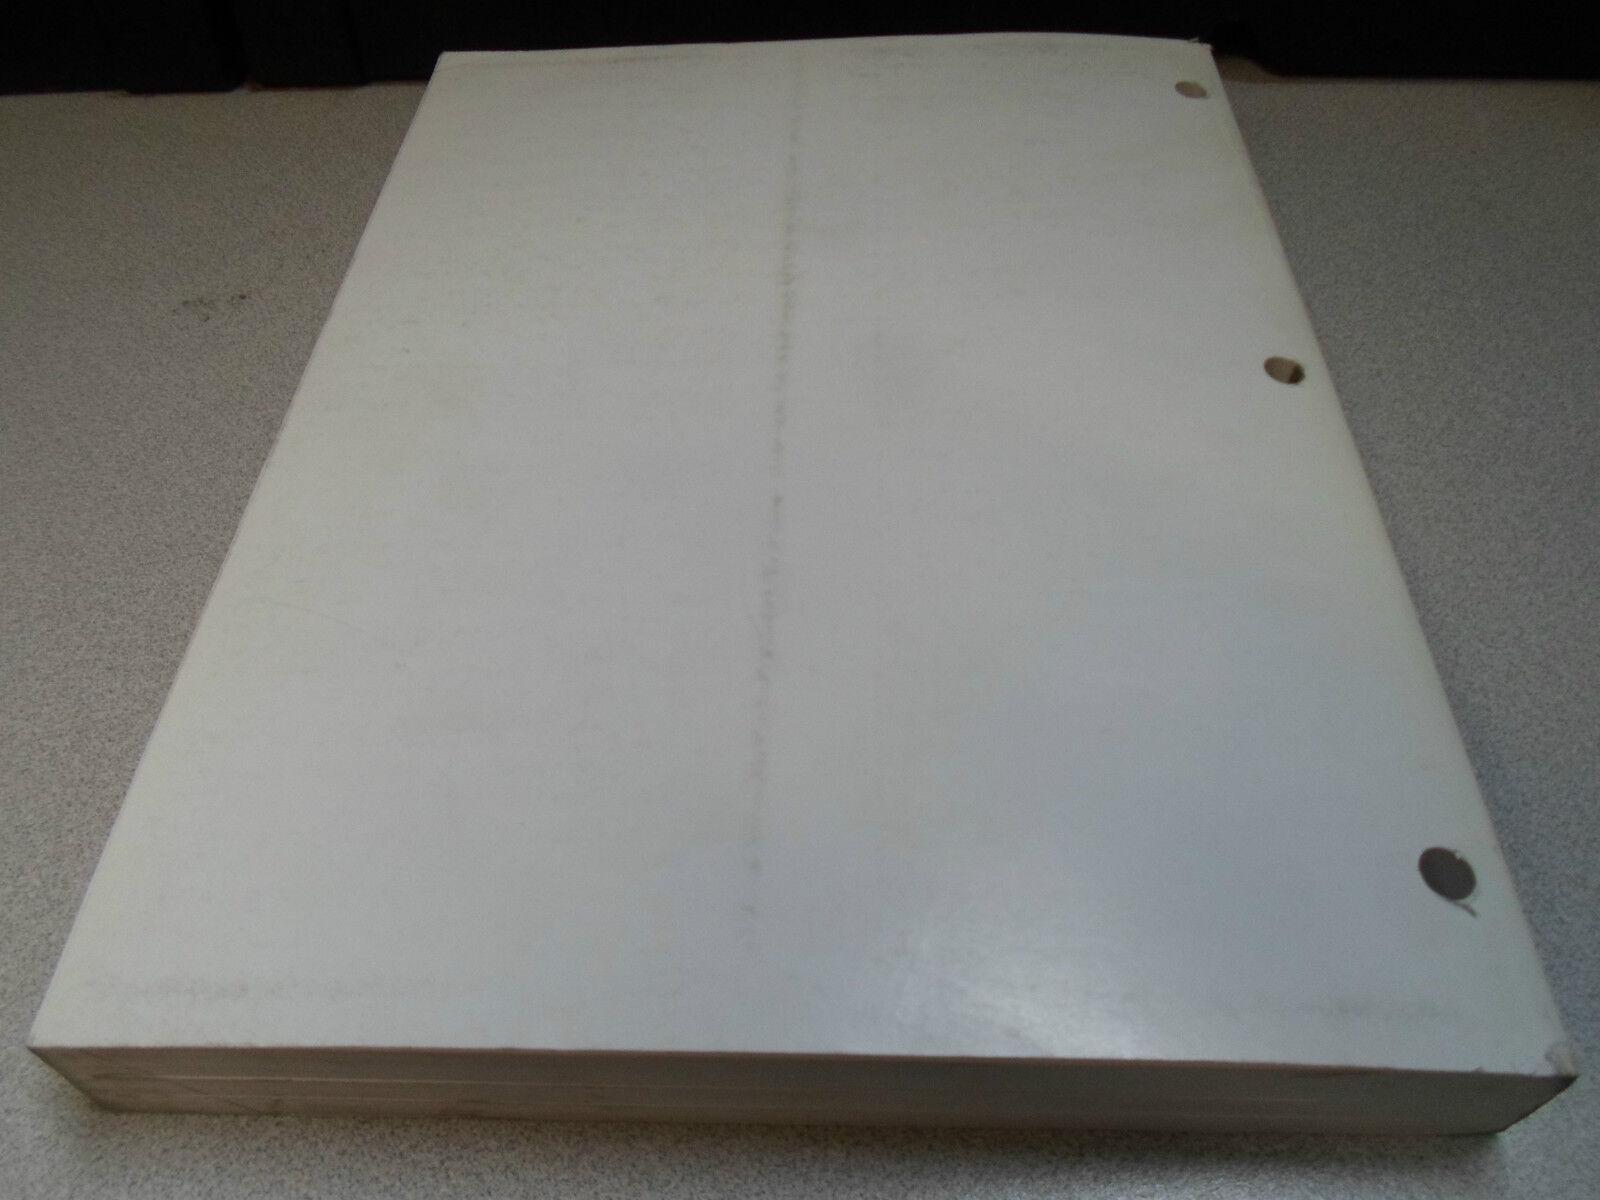 11 of 12 Mercury Mariner Outboards Service Manual 200 225 Optimax DFI 90- 855348R1 OEM x